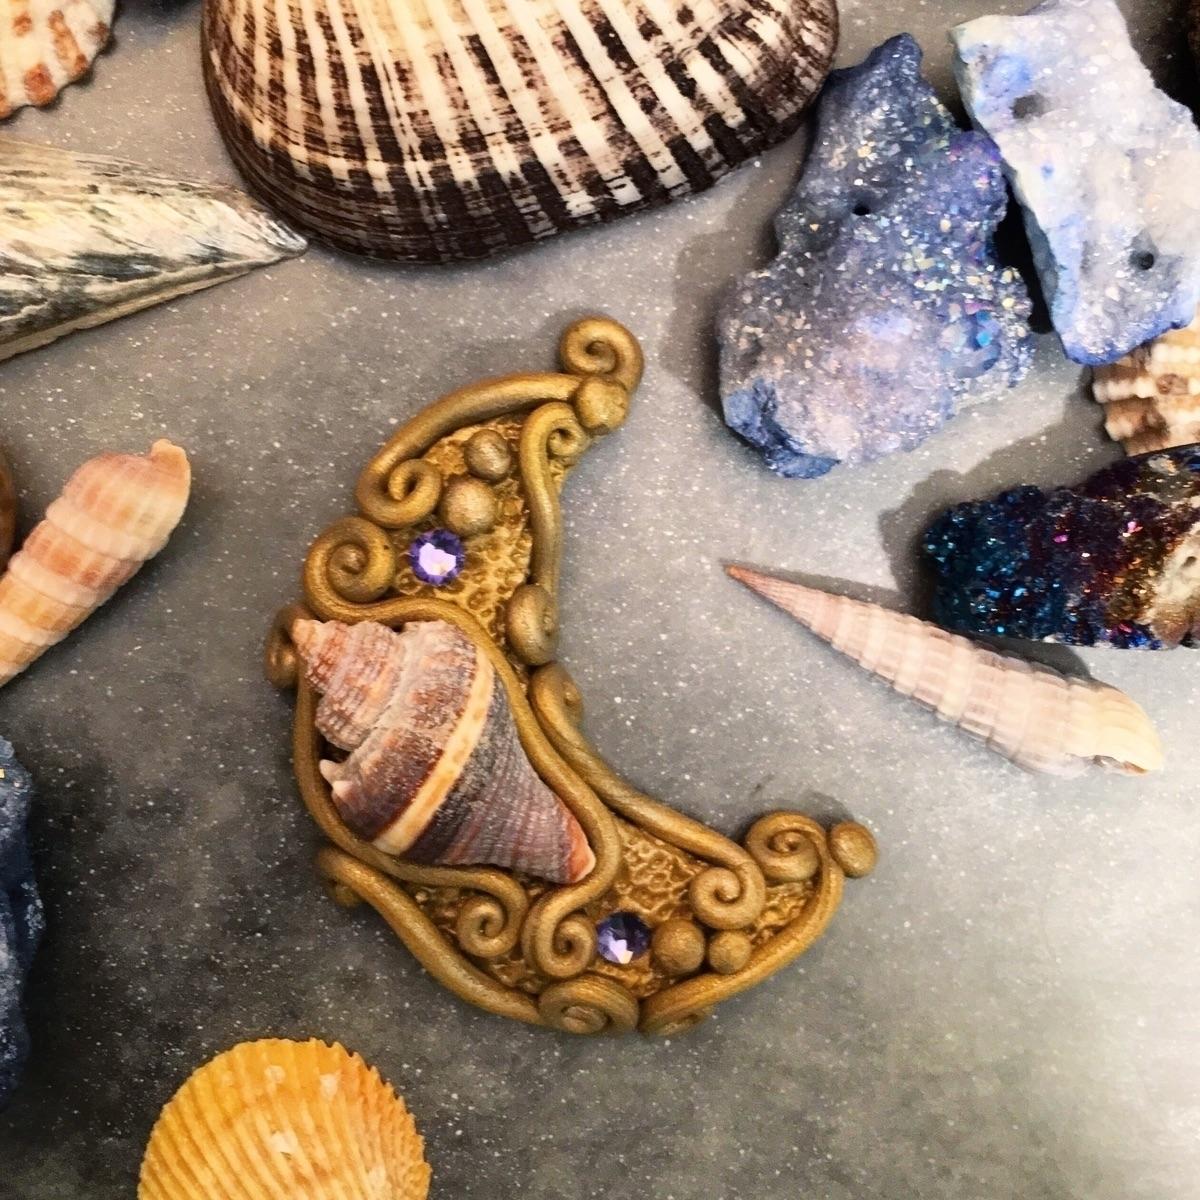 mermaid moon eager finish piece - earthlustdesigns | ello